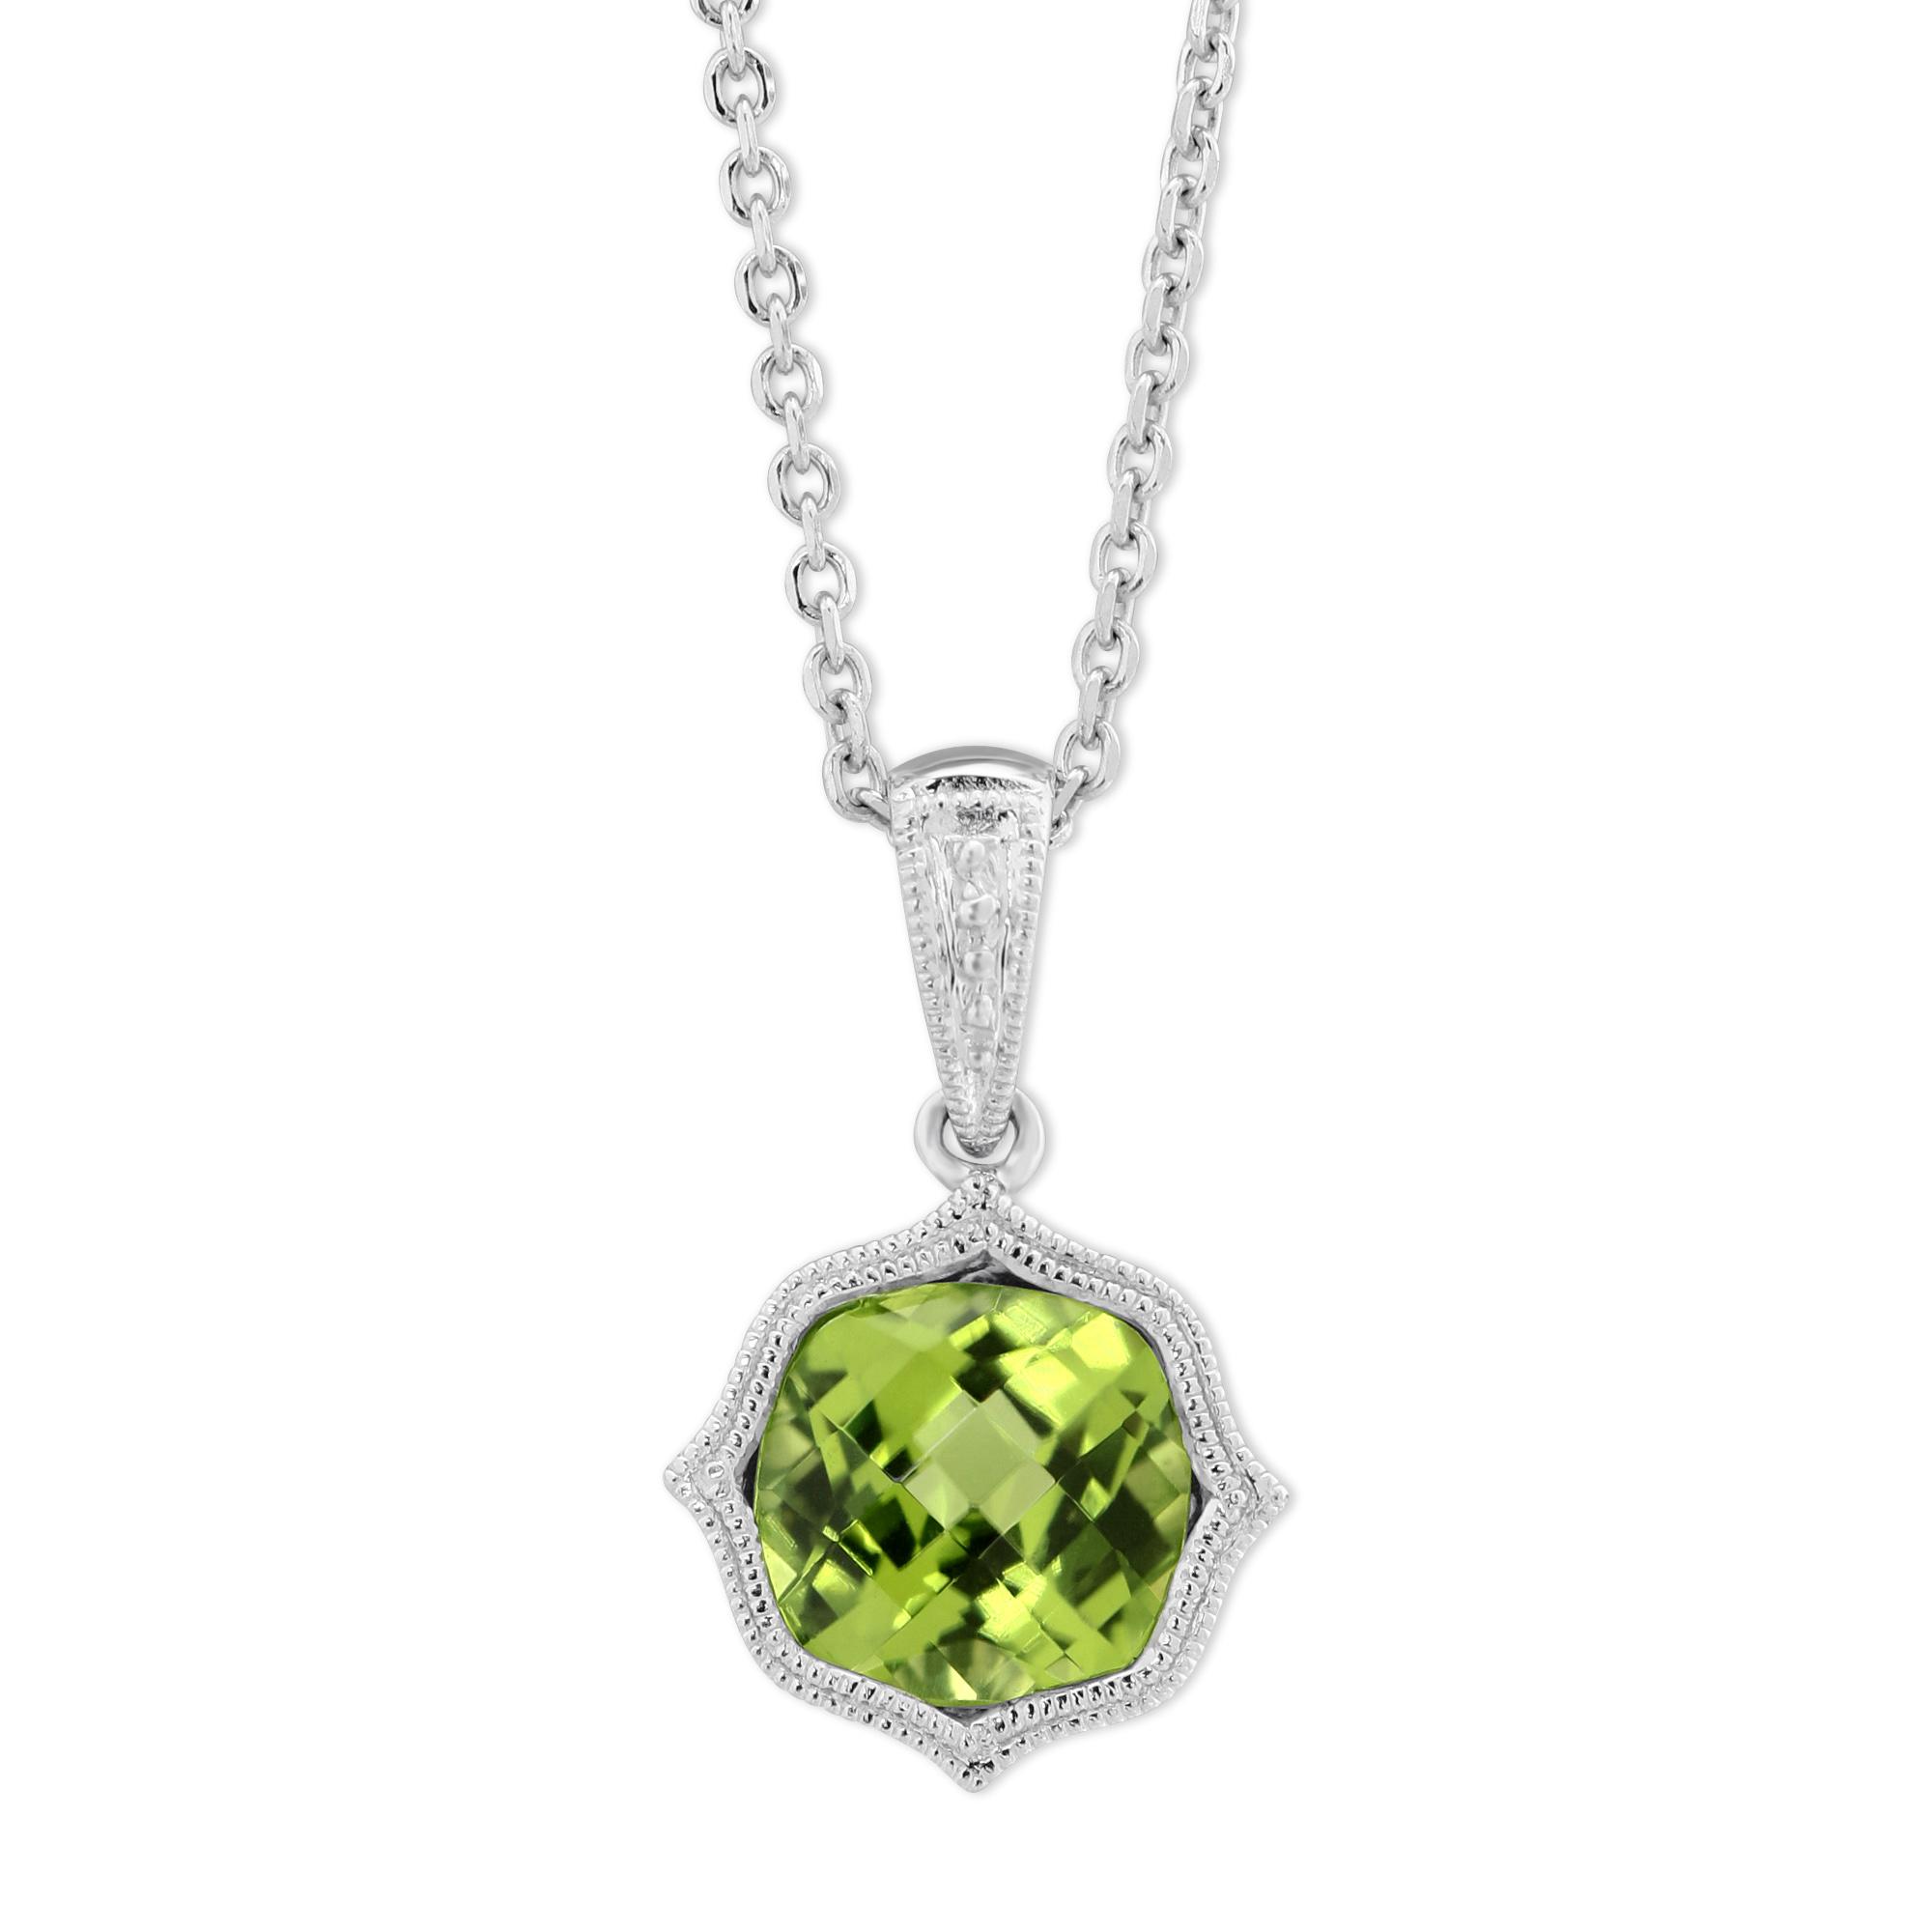 14k white gold peridot pendant with double milgrain 18 borsheims 14k white gold peridot pendant with double milgrain 18 aloadofball Gallery